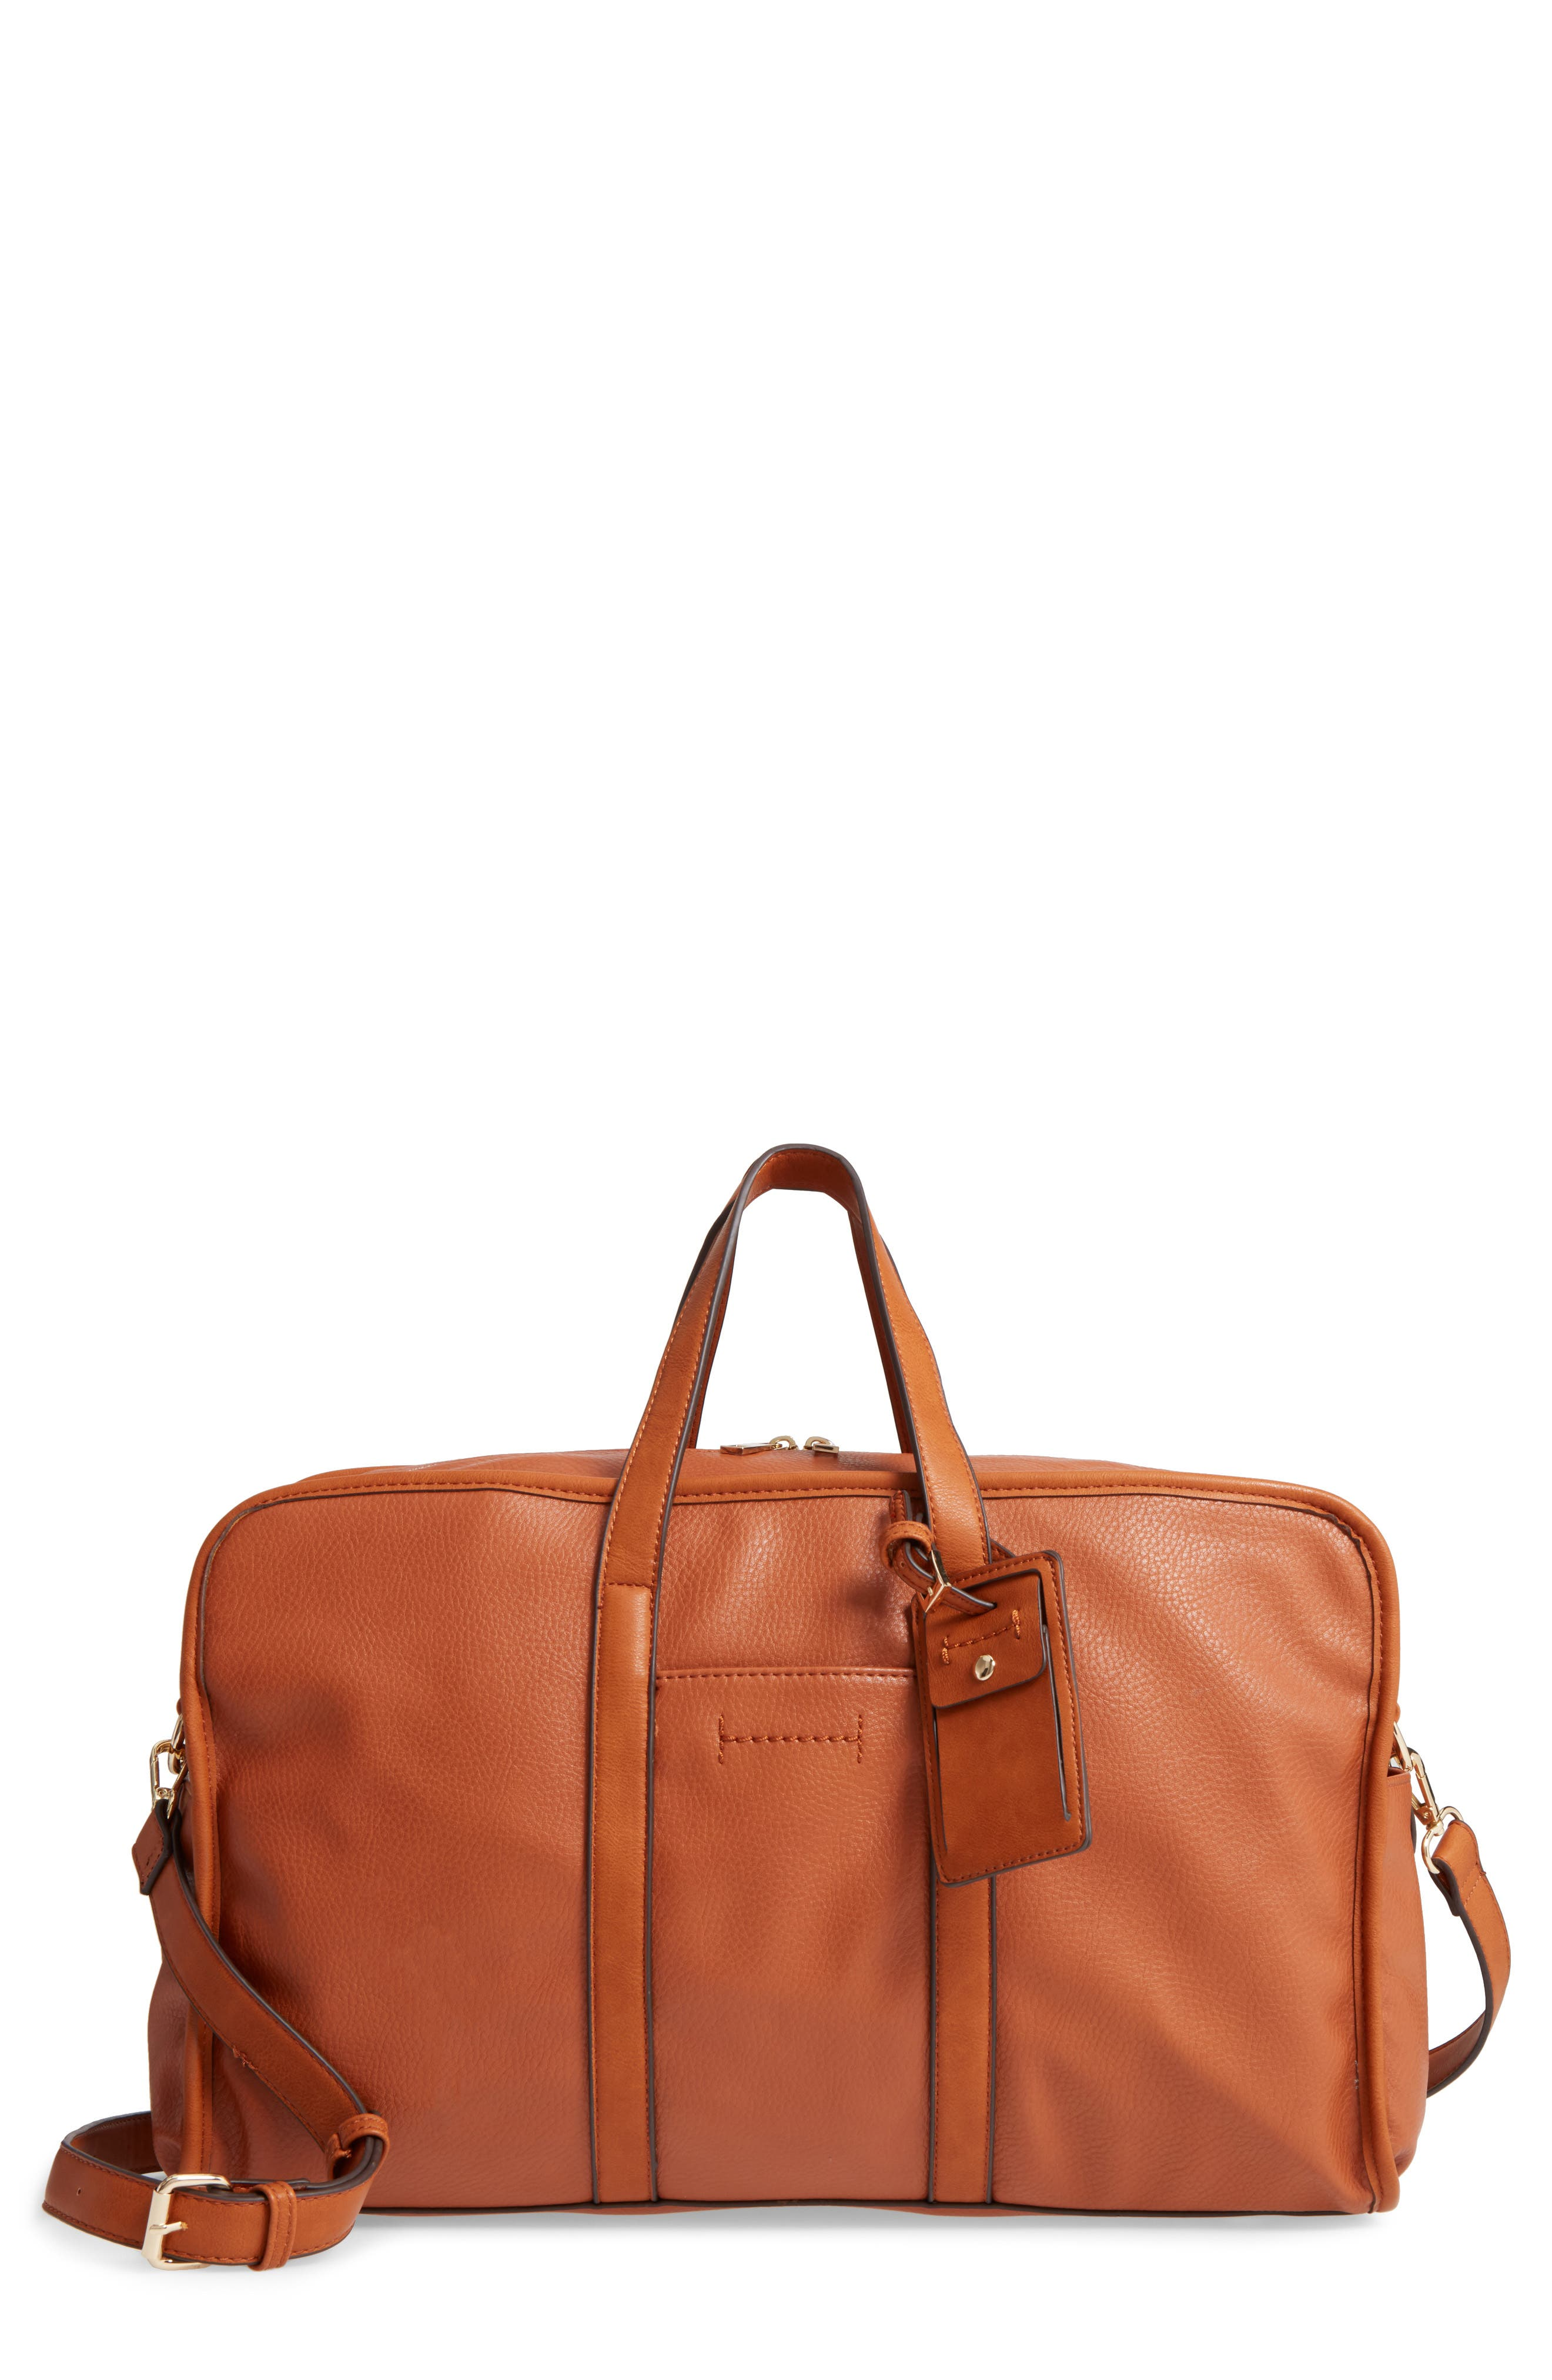 Doxin Faux Leather Duffel Bag,                             Main thumbnail 2, color,